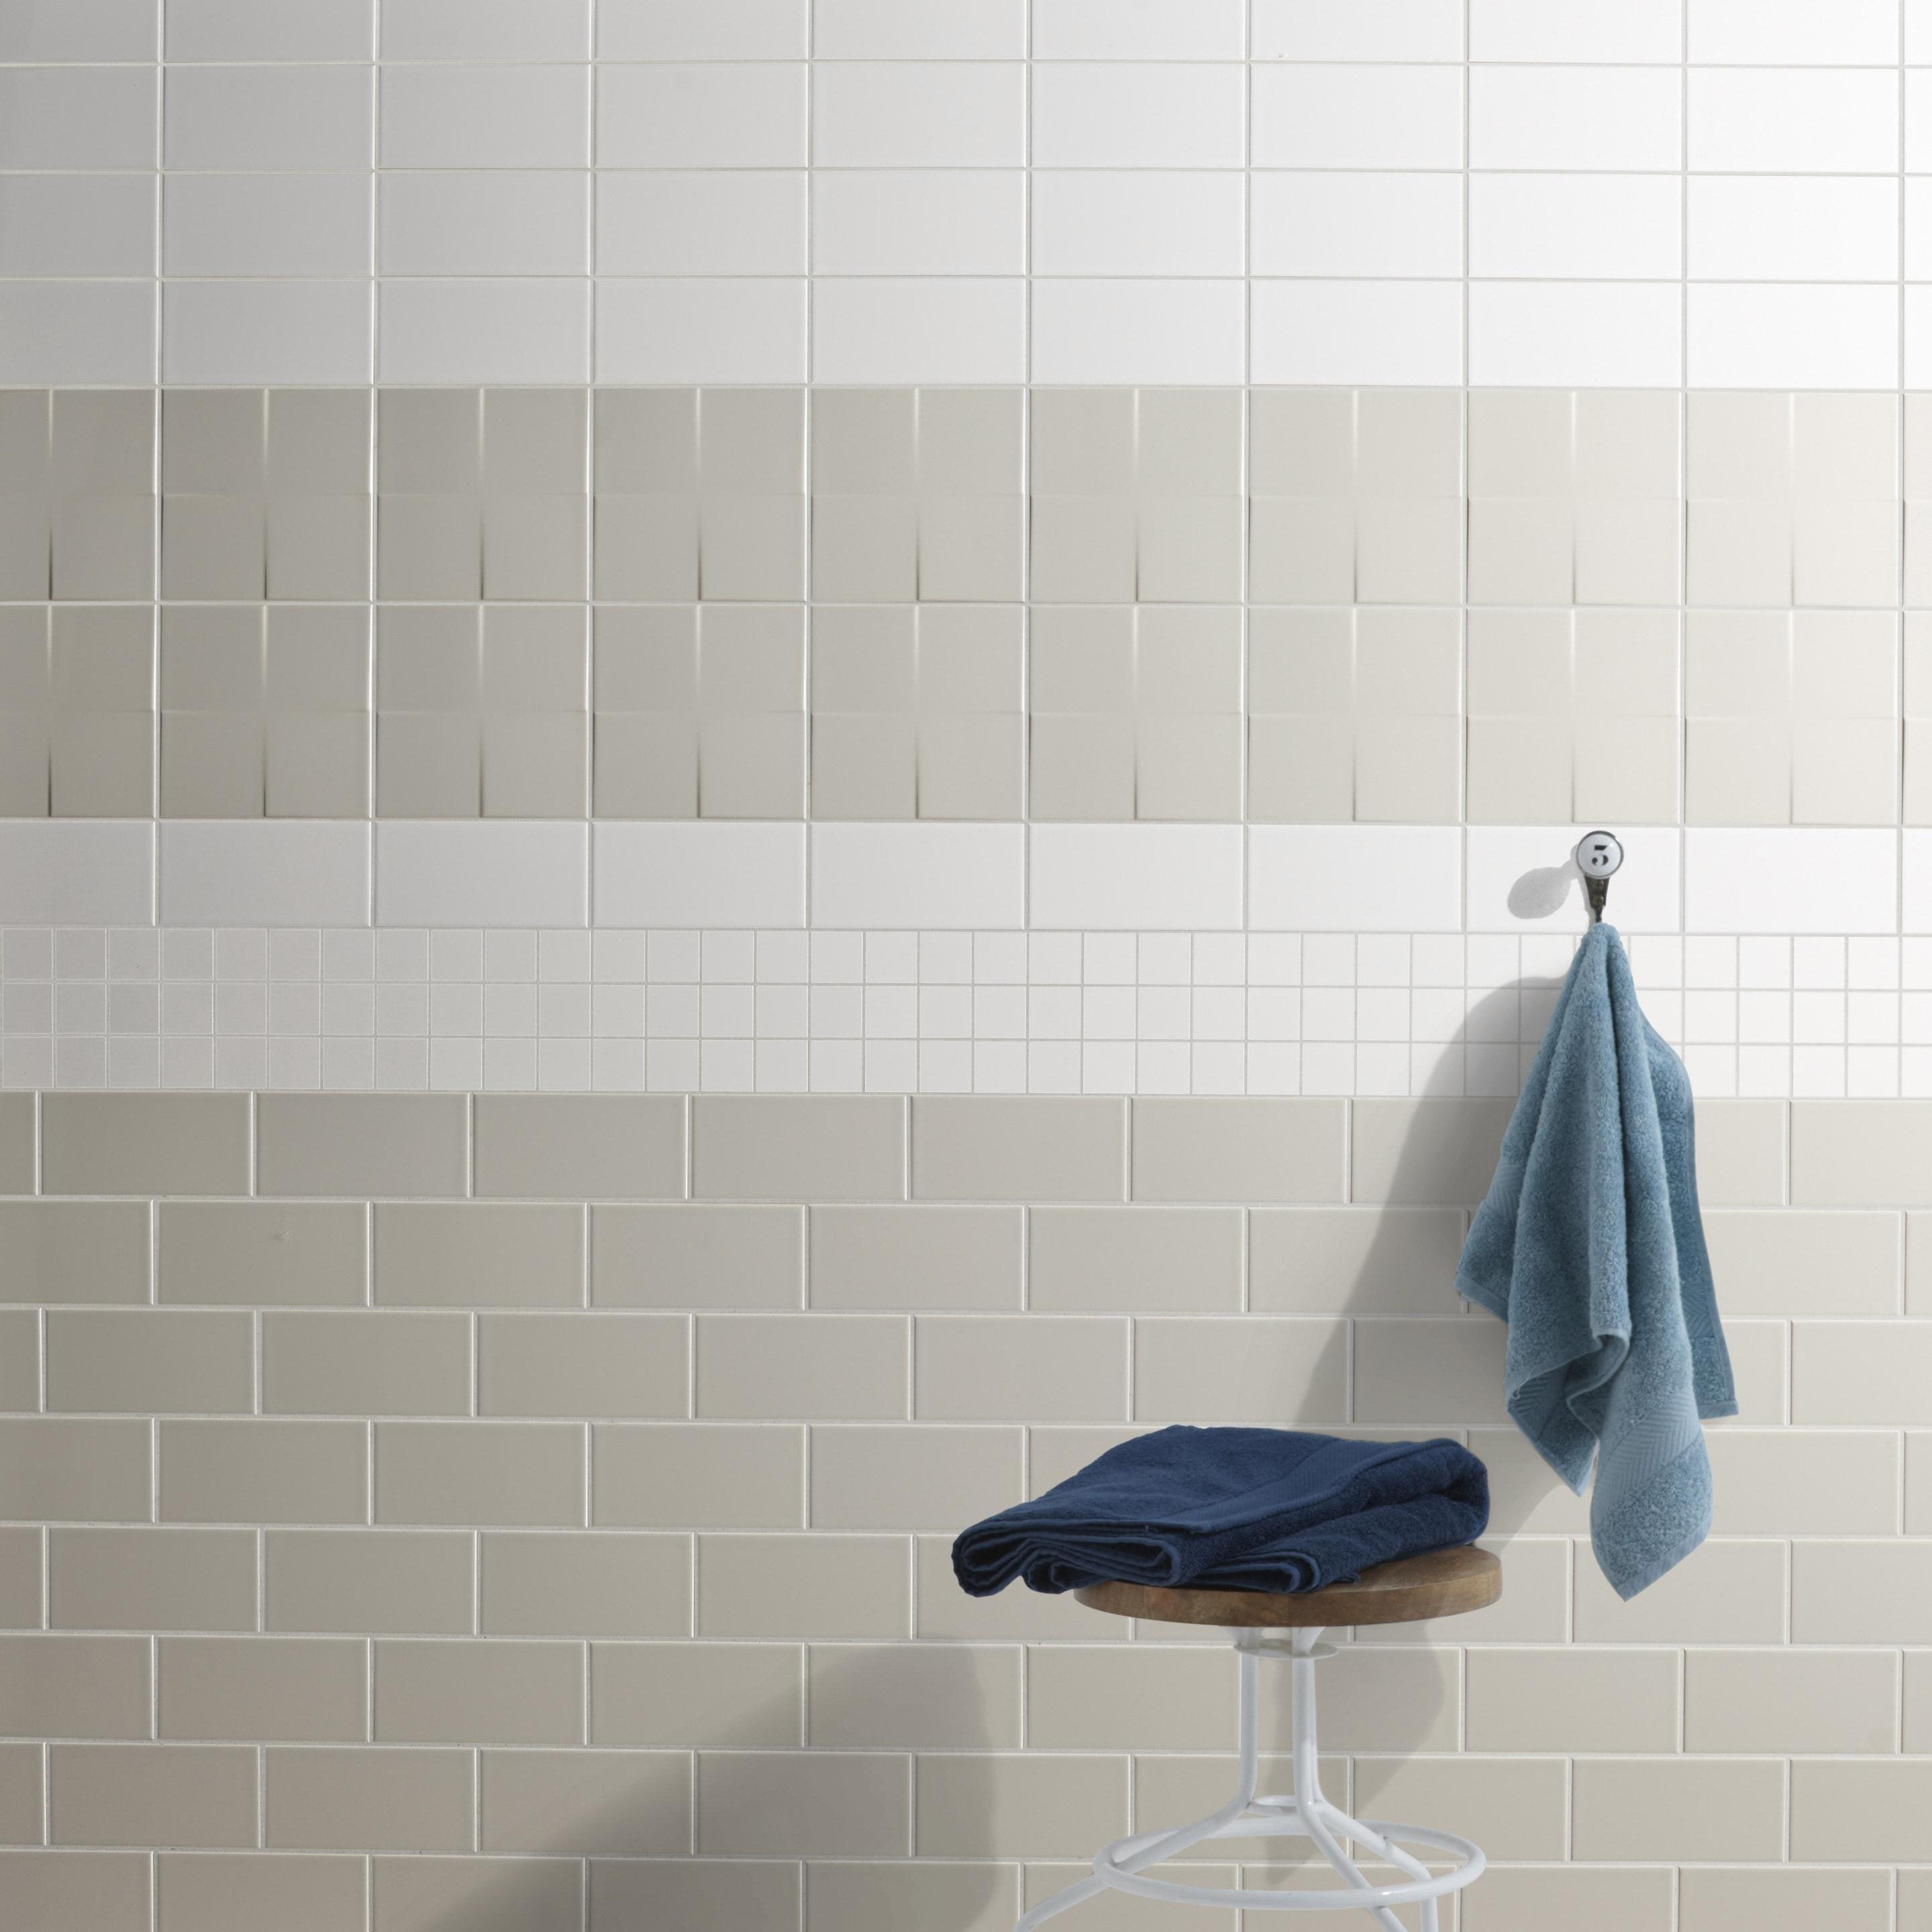 Faïence mur blanc-blanc n°0 brillant l.10 x L.20 cm, Astuce